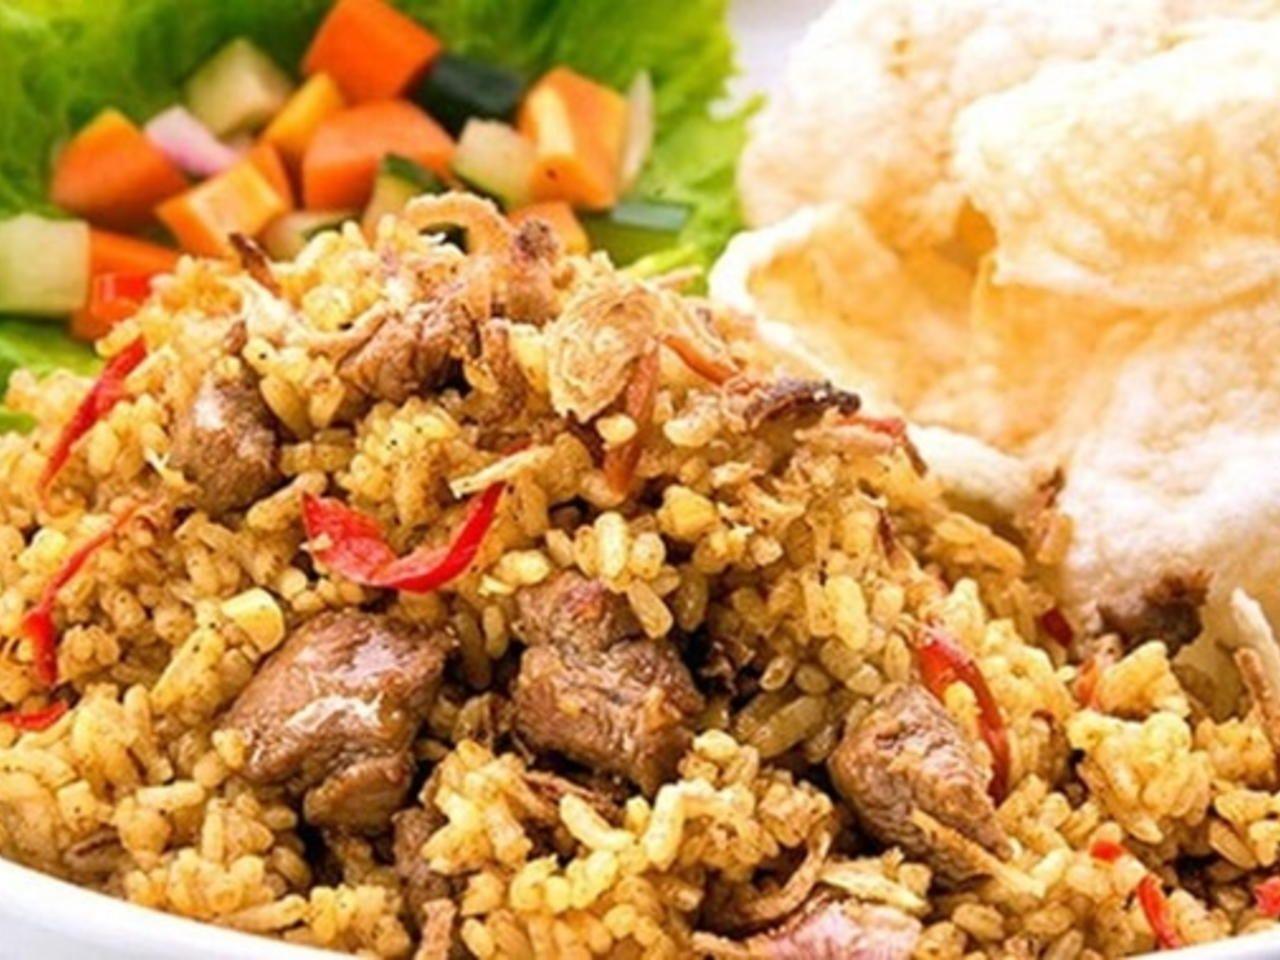 Resep Nasi Goreng Kambing Ala Kebon Sirih Bango Dan Cara Mengolah Nasi Goreng Daging Kambing Agar Tidak Bau Prengus Serta Resep Nas Resep Resep Masakan Masakan